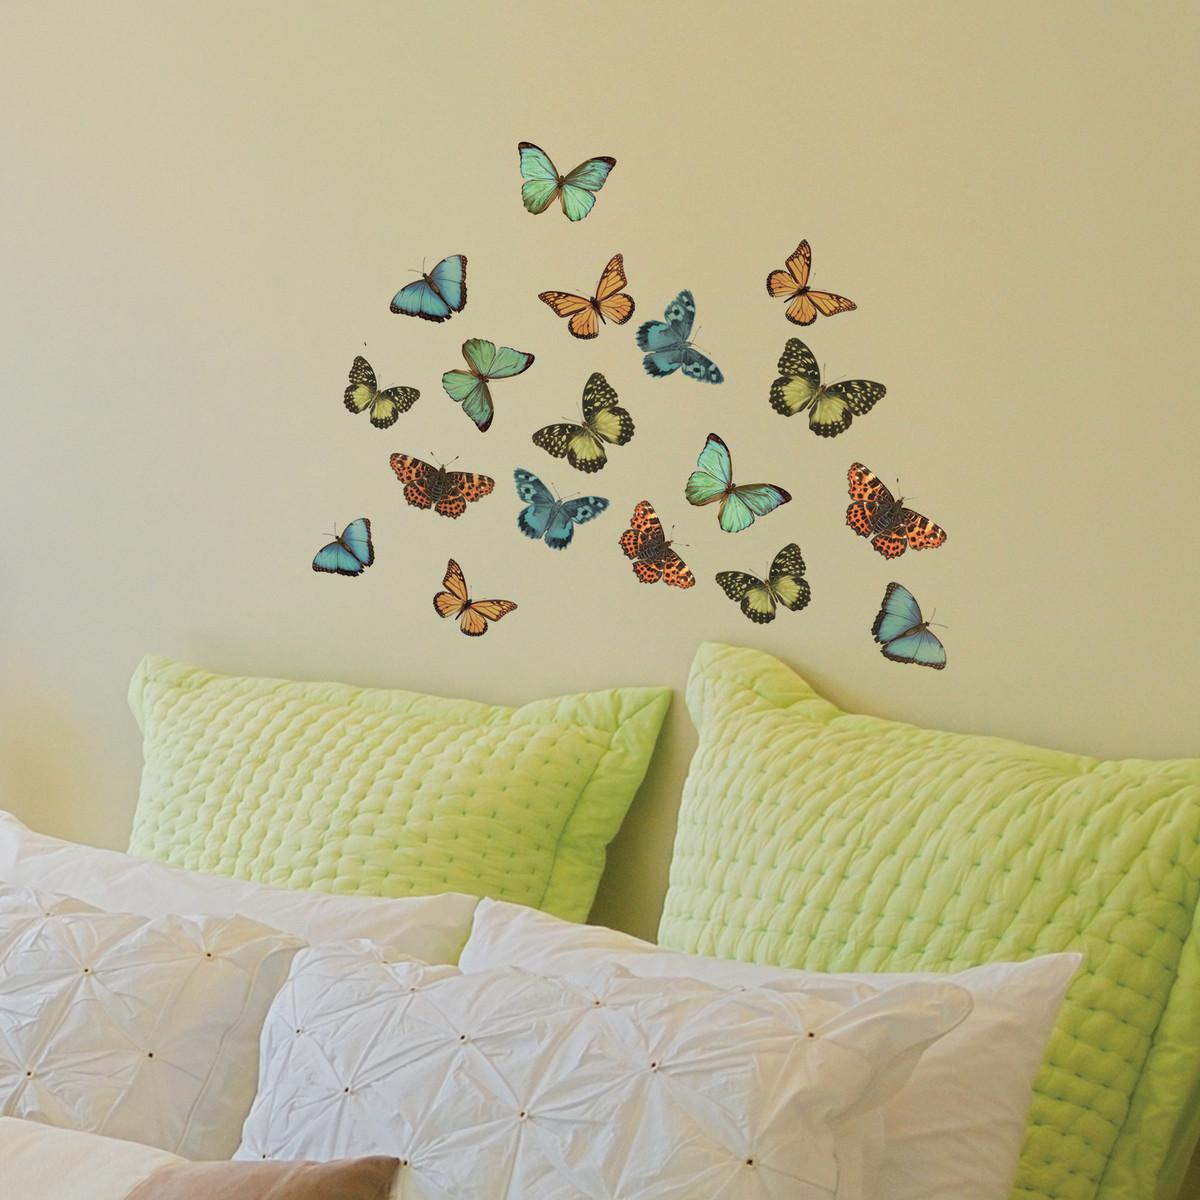 adesivi murali e stickers murali da parete decorativi | leroy merlin - Decorazioni Per Pareti Sala